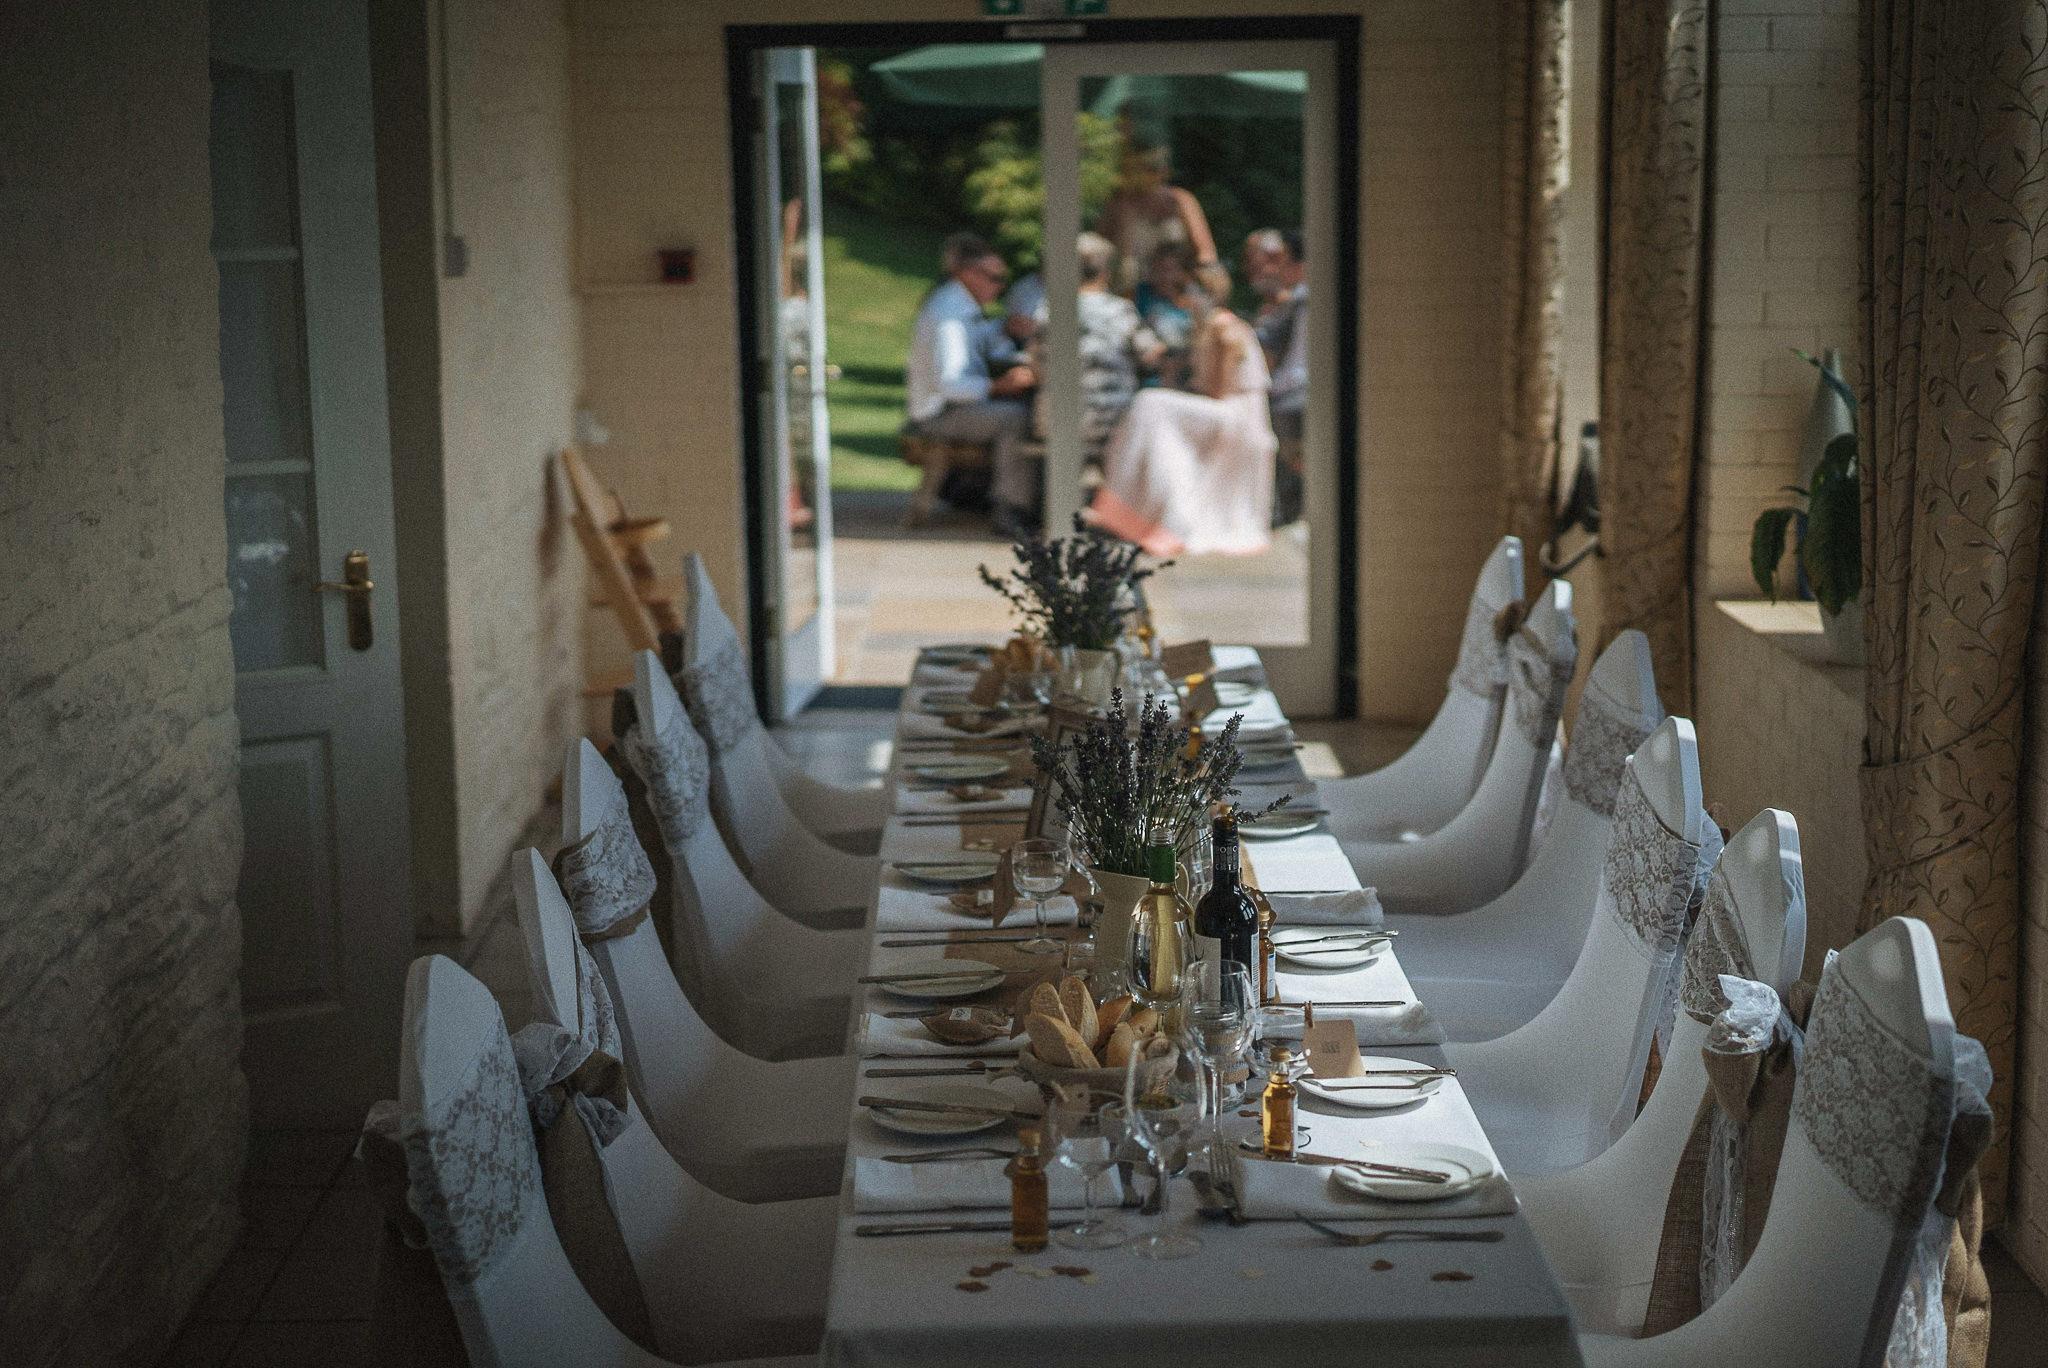 paul-marbrook-Caer-Llan-Wedding-Photographer-90070